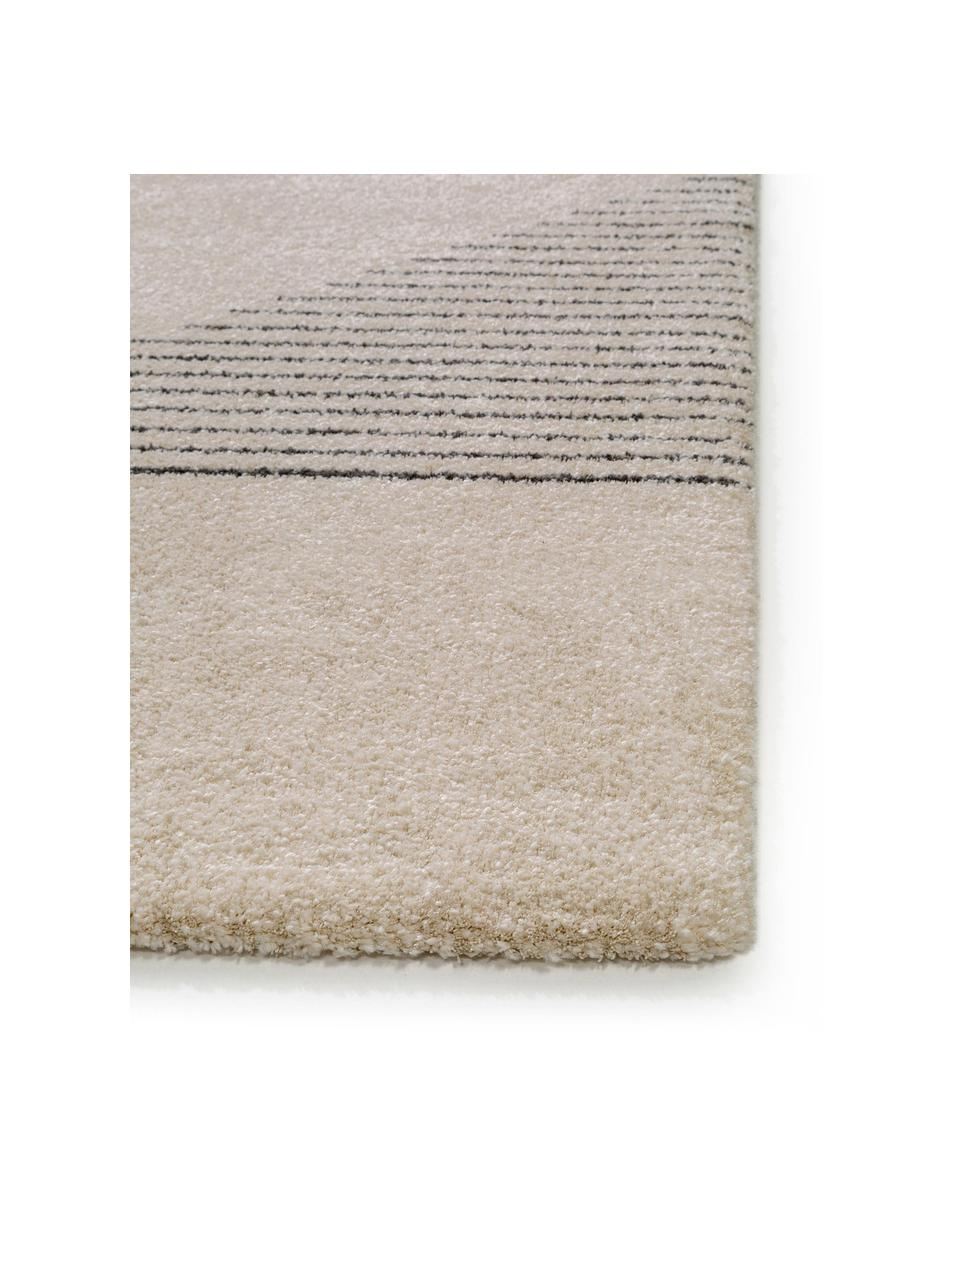 Teppich Narvik mit abstraktem Muster, 60% Polyester, 40% Polypropylen, Creme, Schwarz, B 200 x L 290 cm (Größe L)